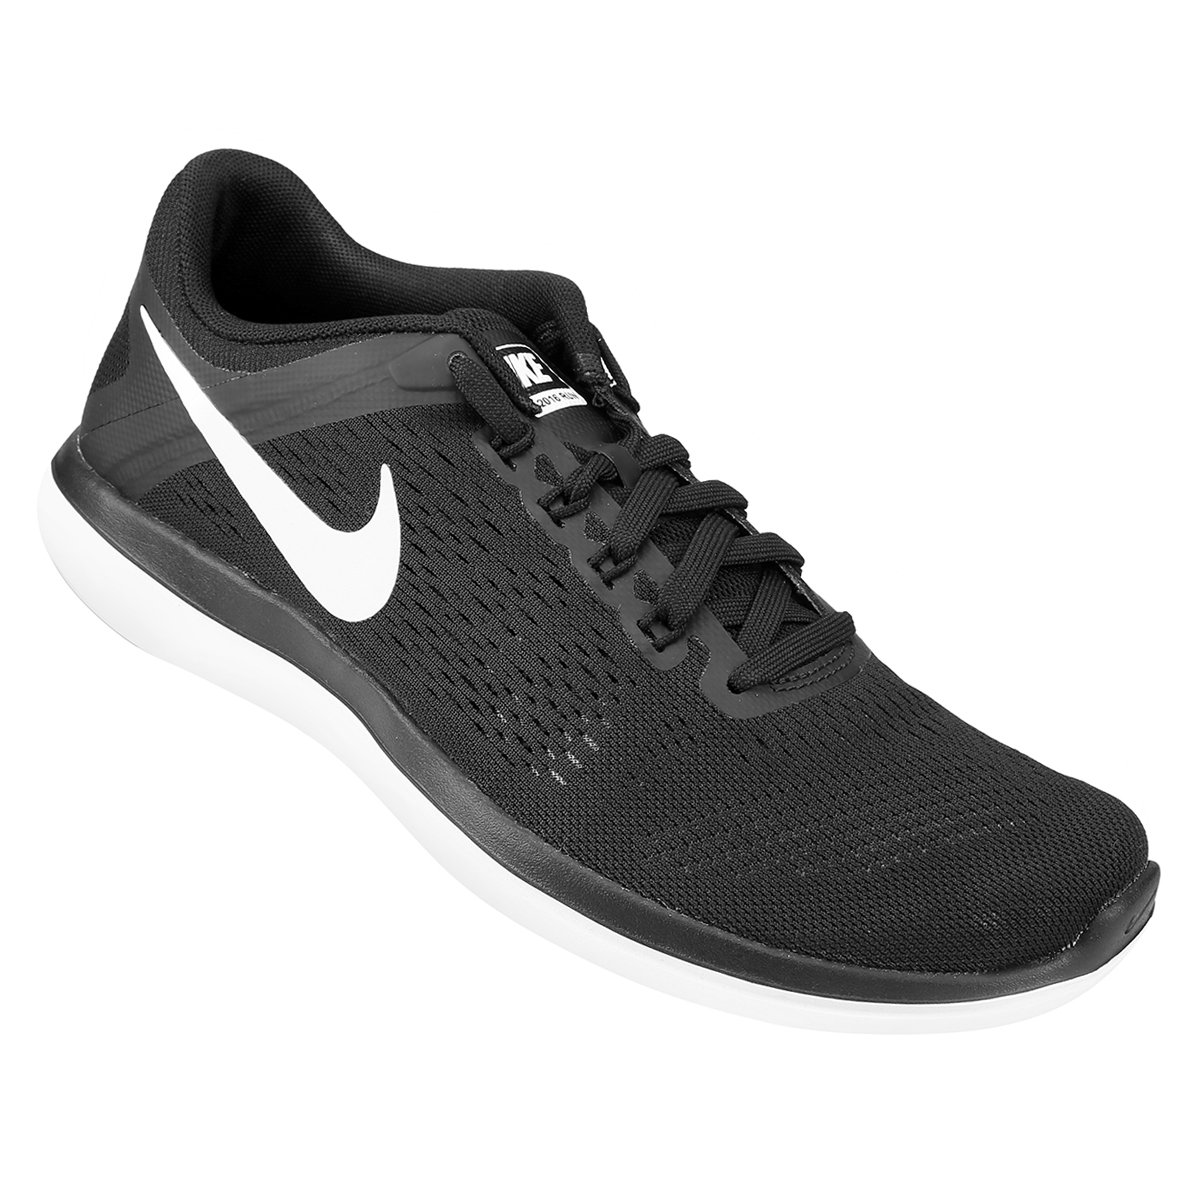 ... Tênis Nike Flex 2016 RN Masculino - Compre Agora Netshoes  f2289854af1392 ... c9d10e461f382